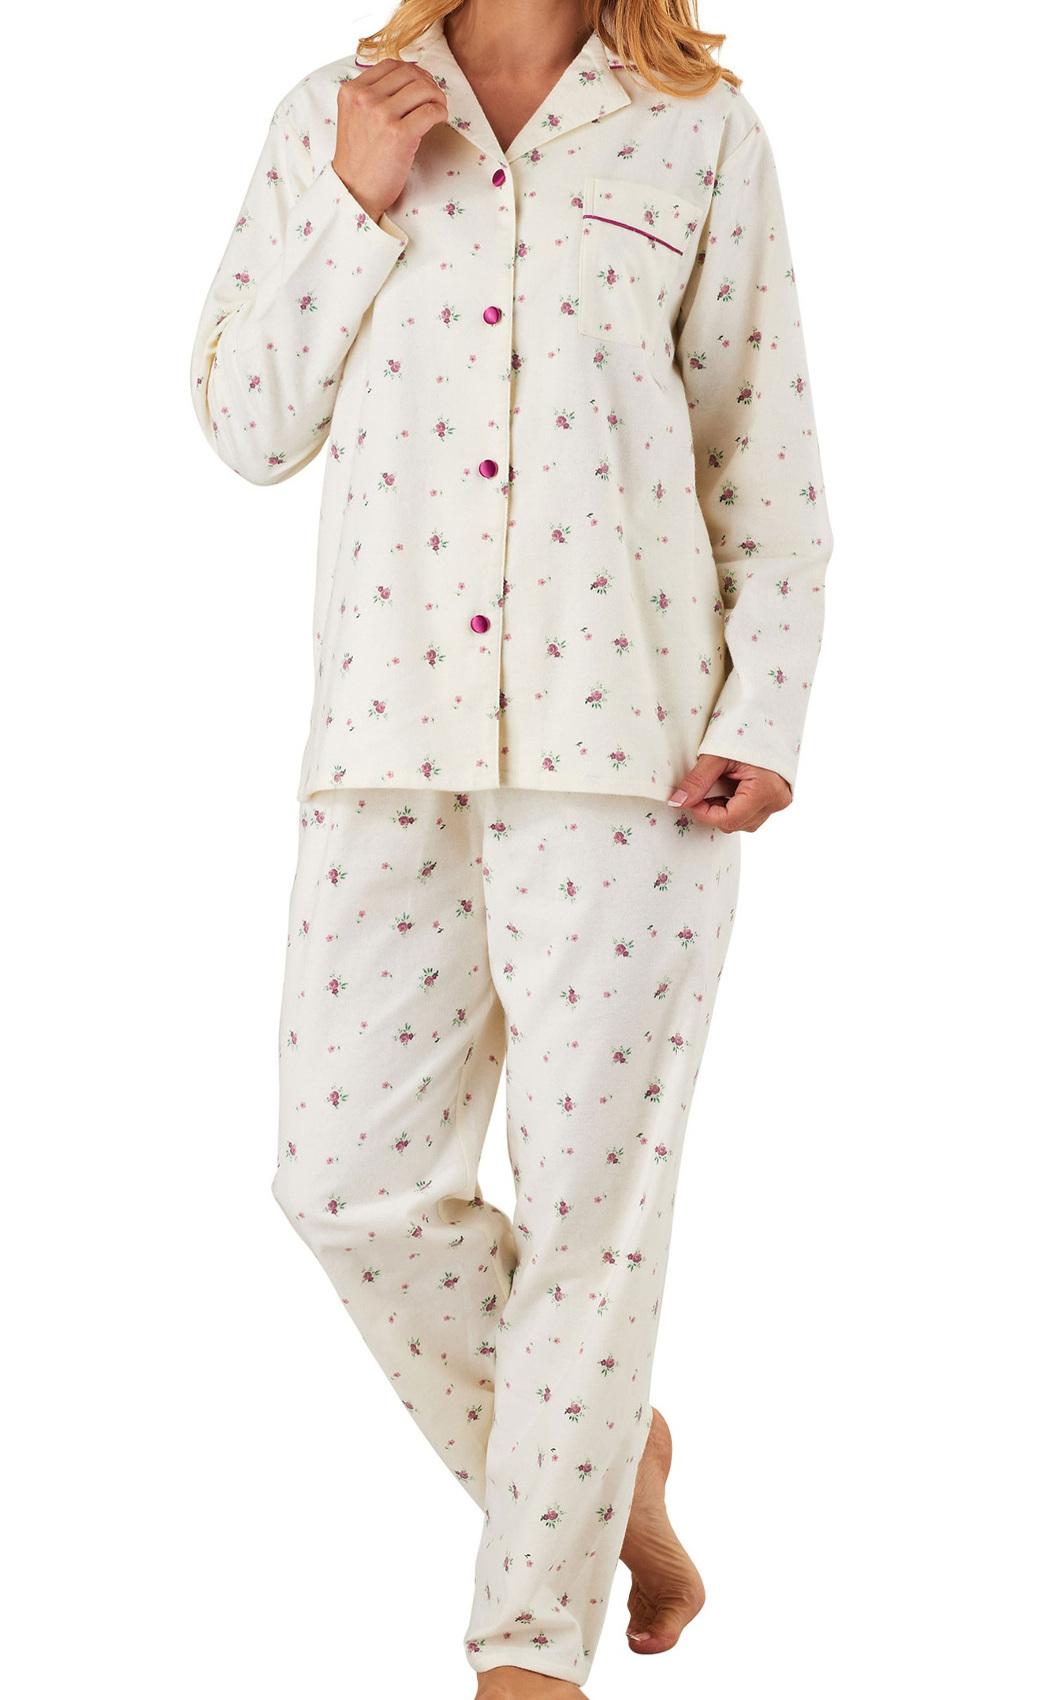 Ladies Slenderella Floral Pyjamas Button Up Top   Bottoms Flannel Cotton PJ  Set 9ed04b9fa3